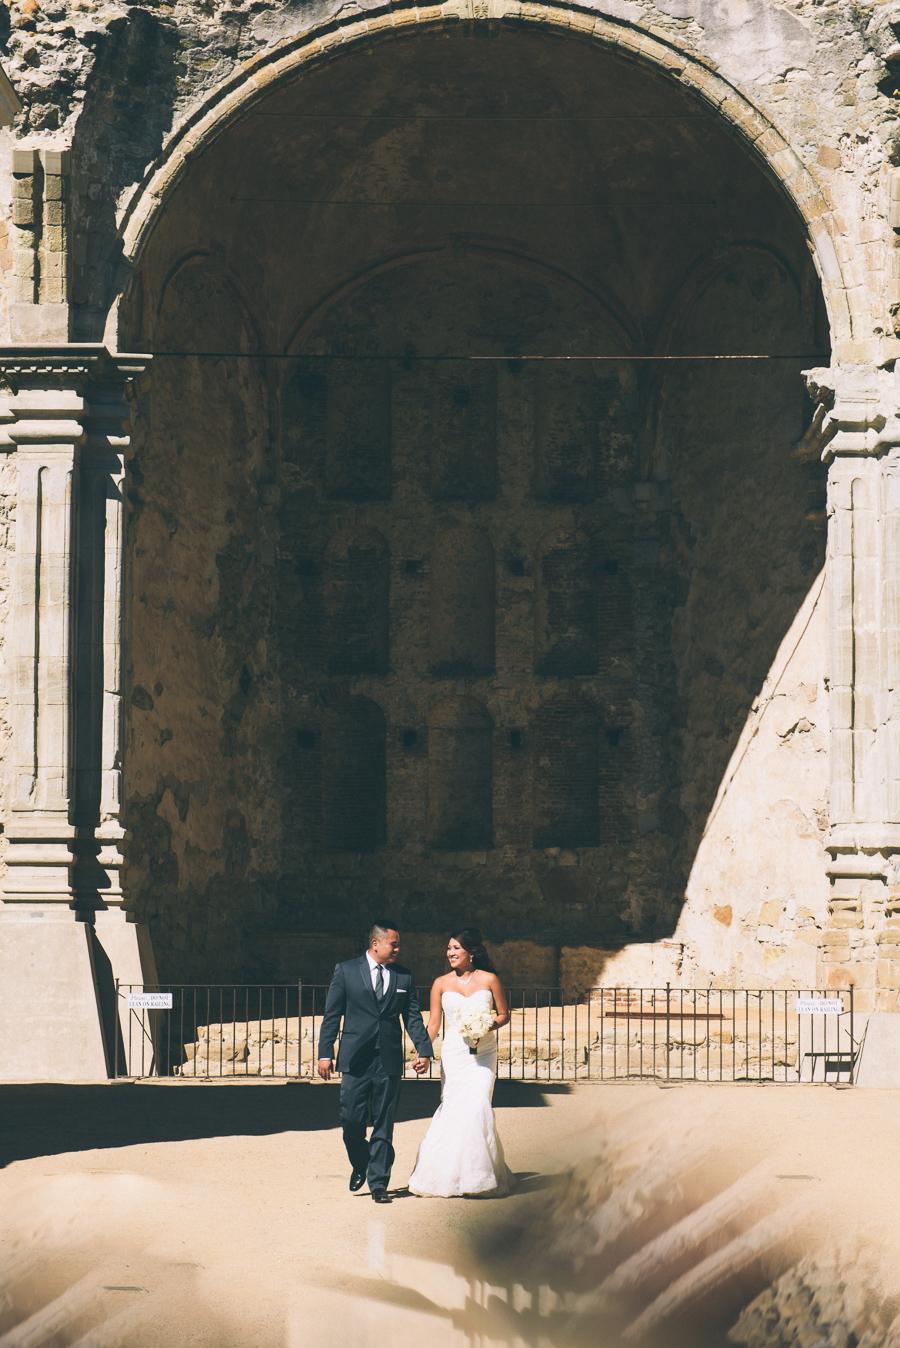 San Juan Capistrano Mission wedding portrait